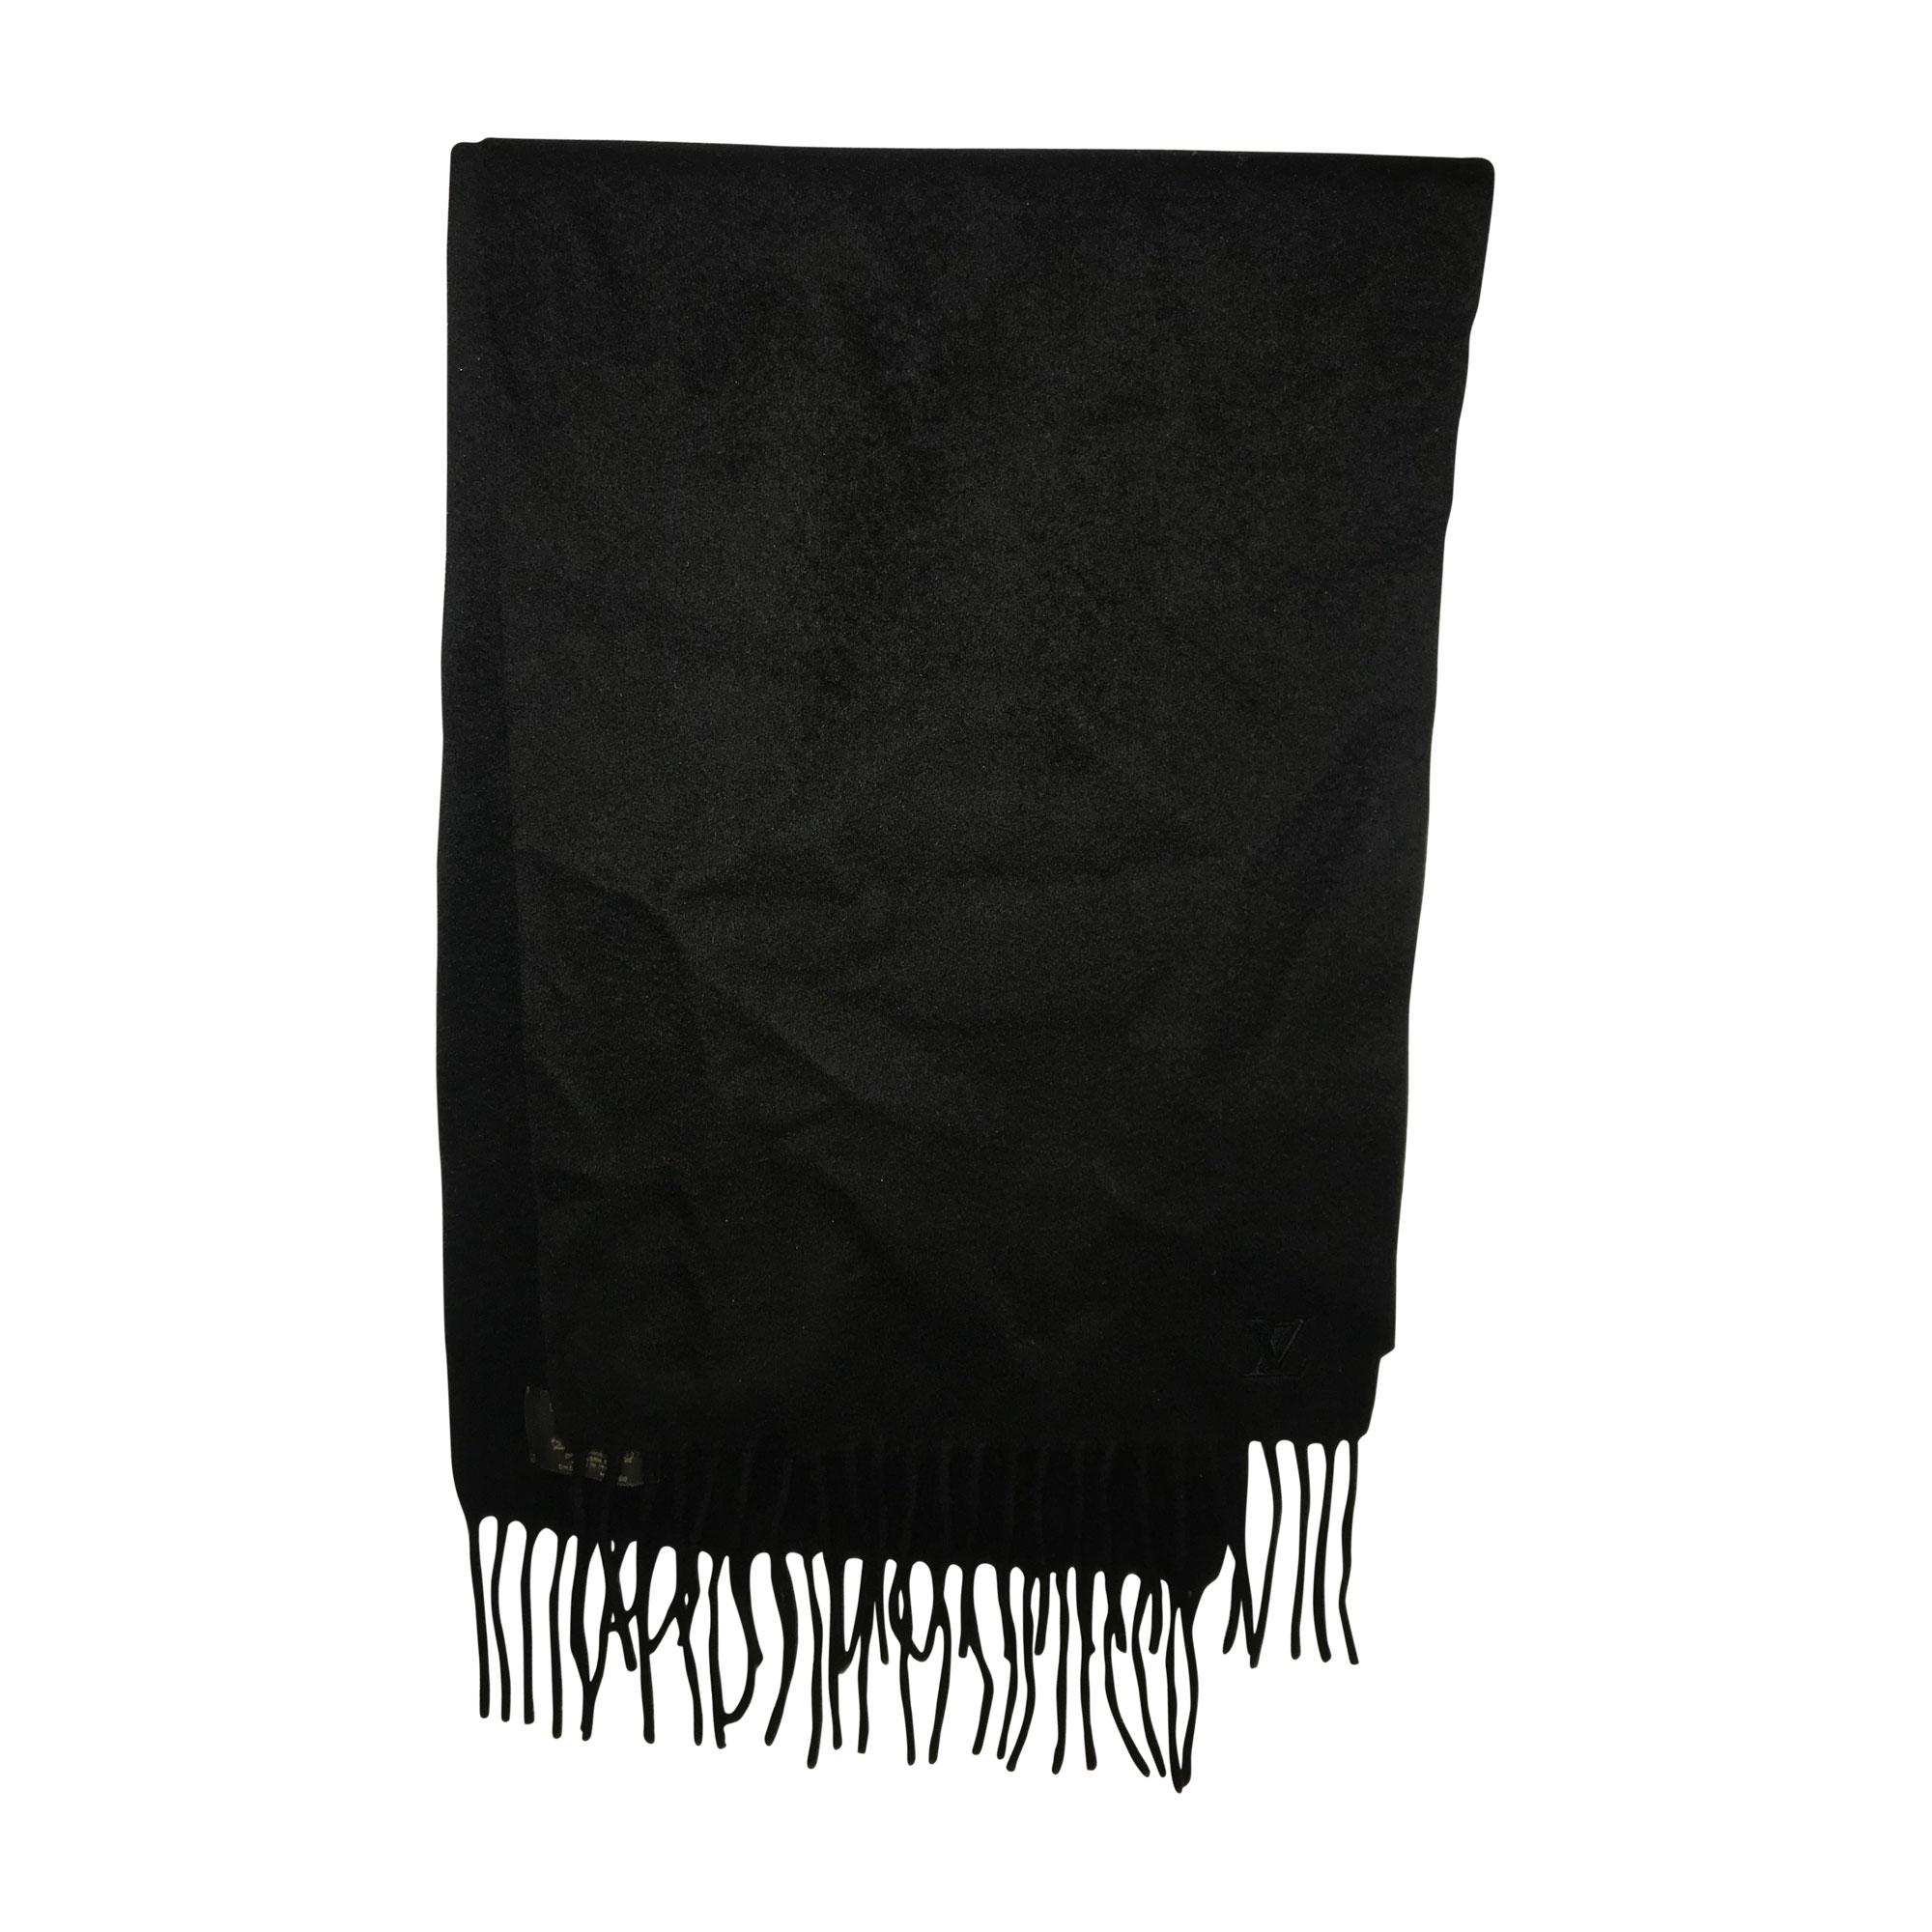 Echarpe LOUIS VUITTON noir - 7459157 e55ab2fe7f3